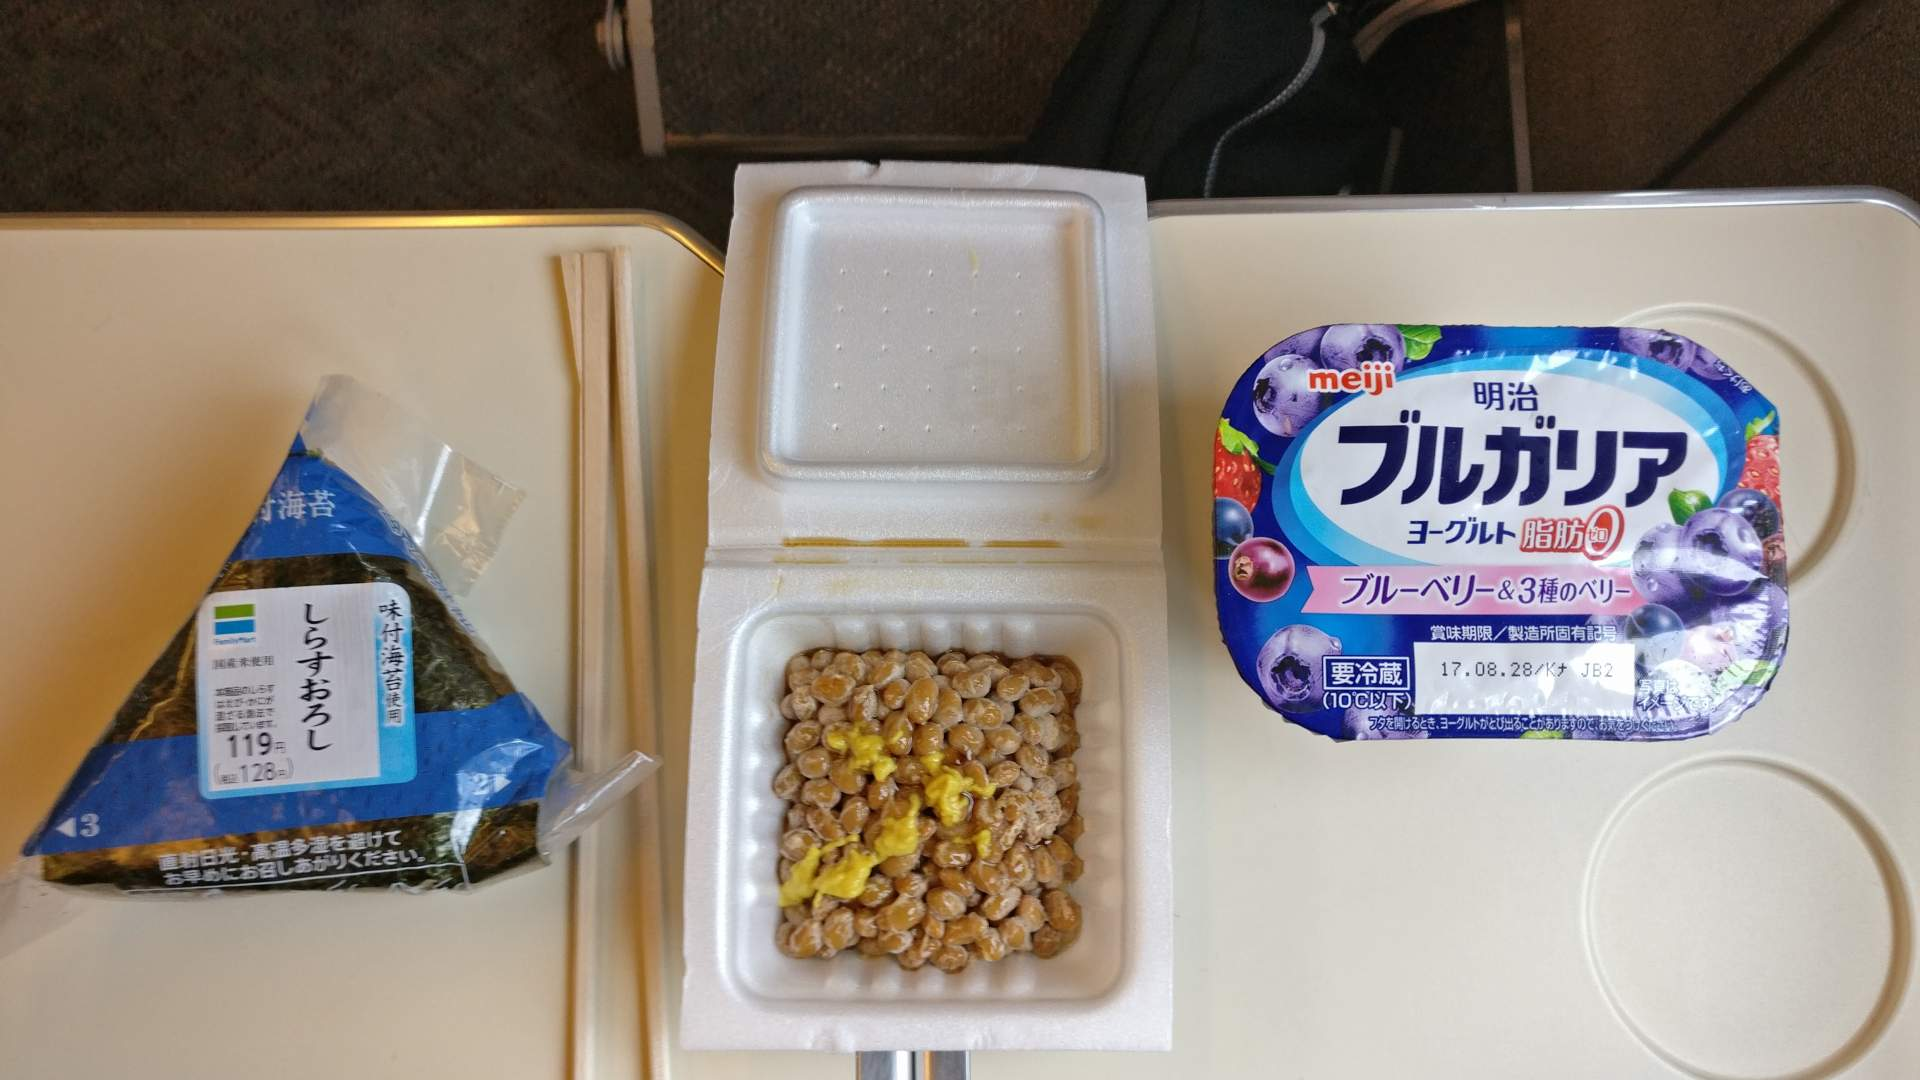 Tokyo ontbijt in de trein